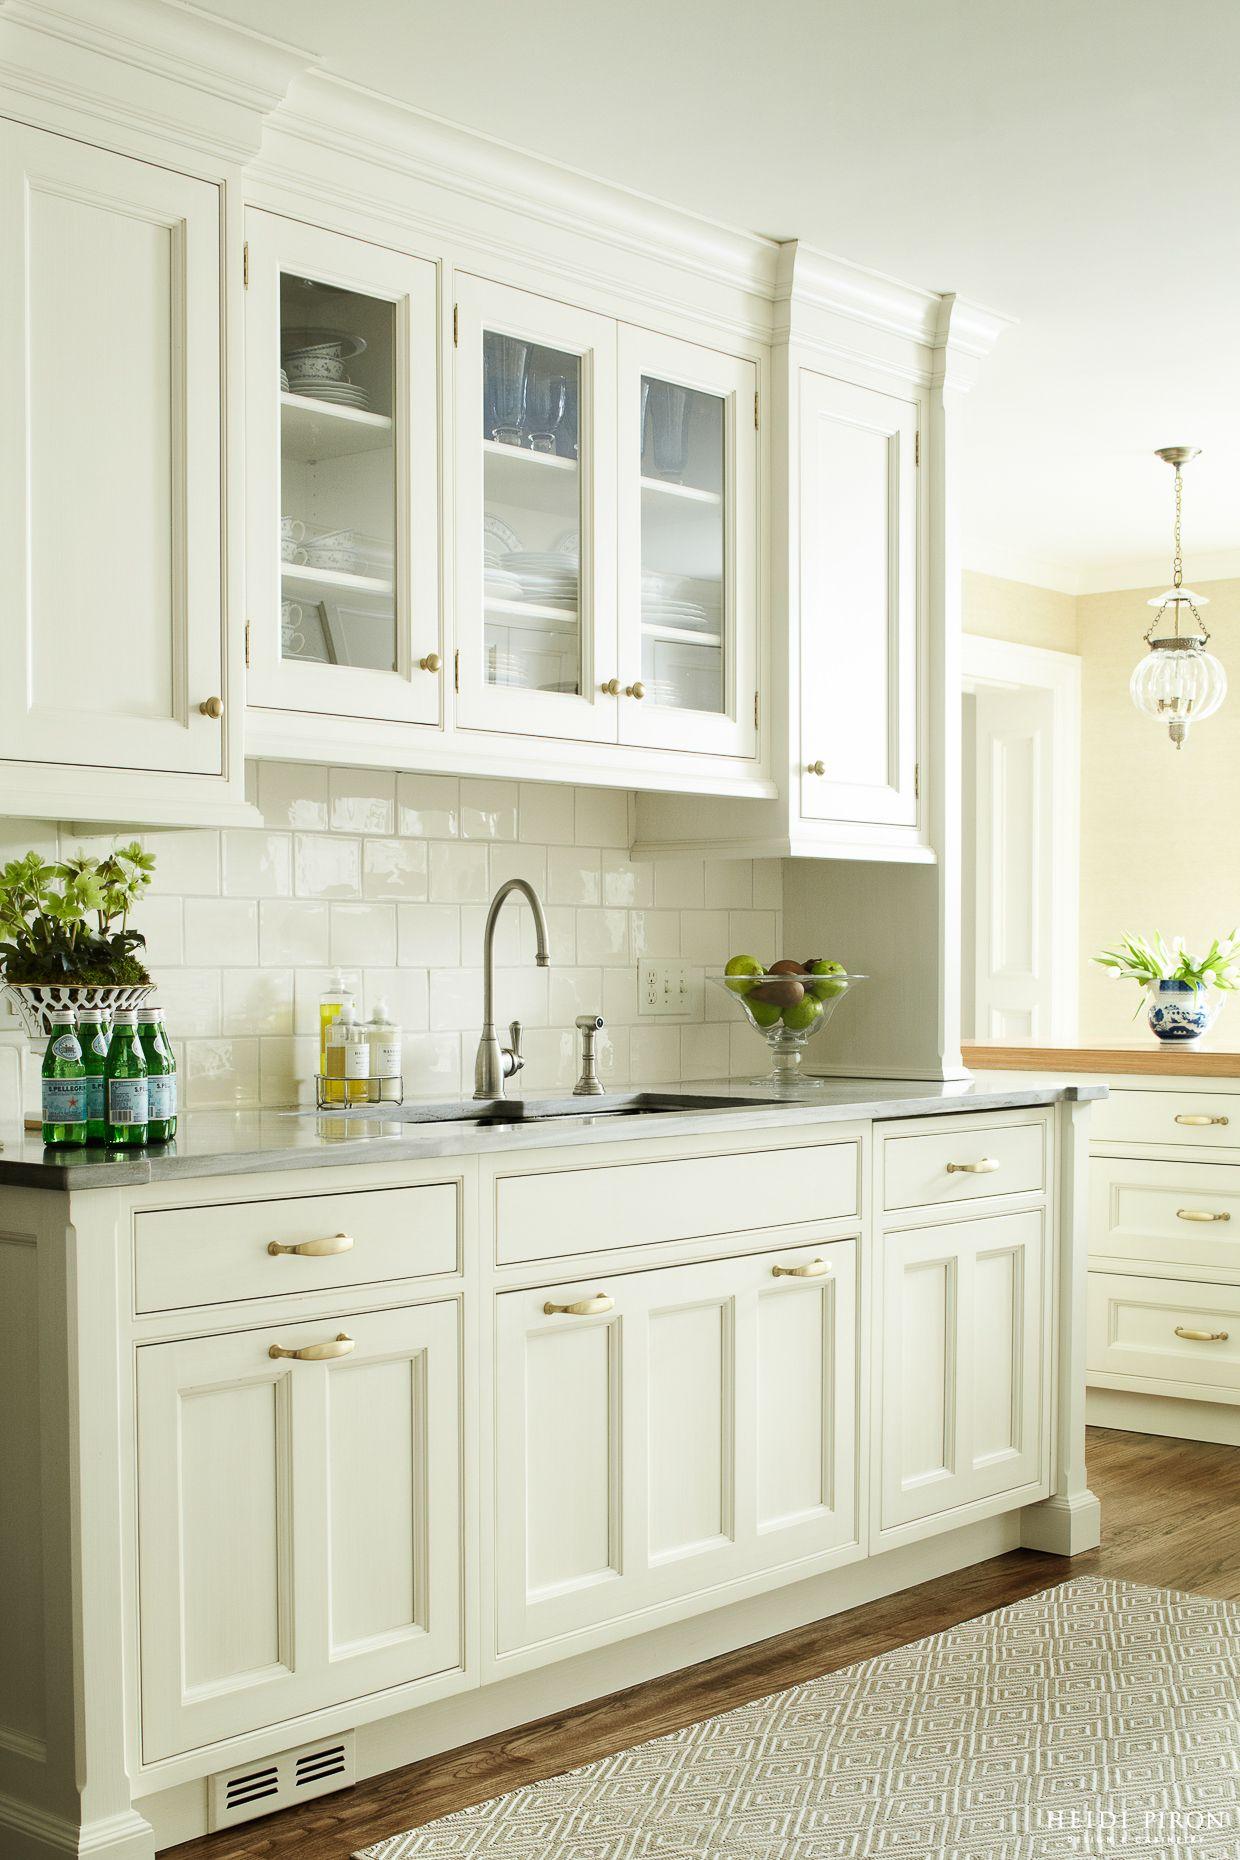 Traditional   Off white kitchen cabinets, White kitchen ...